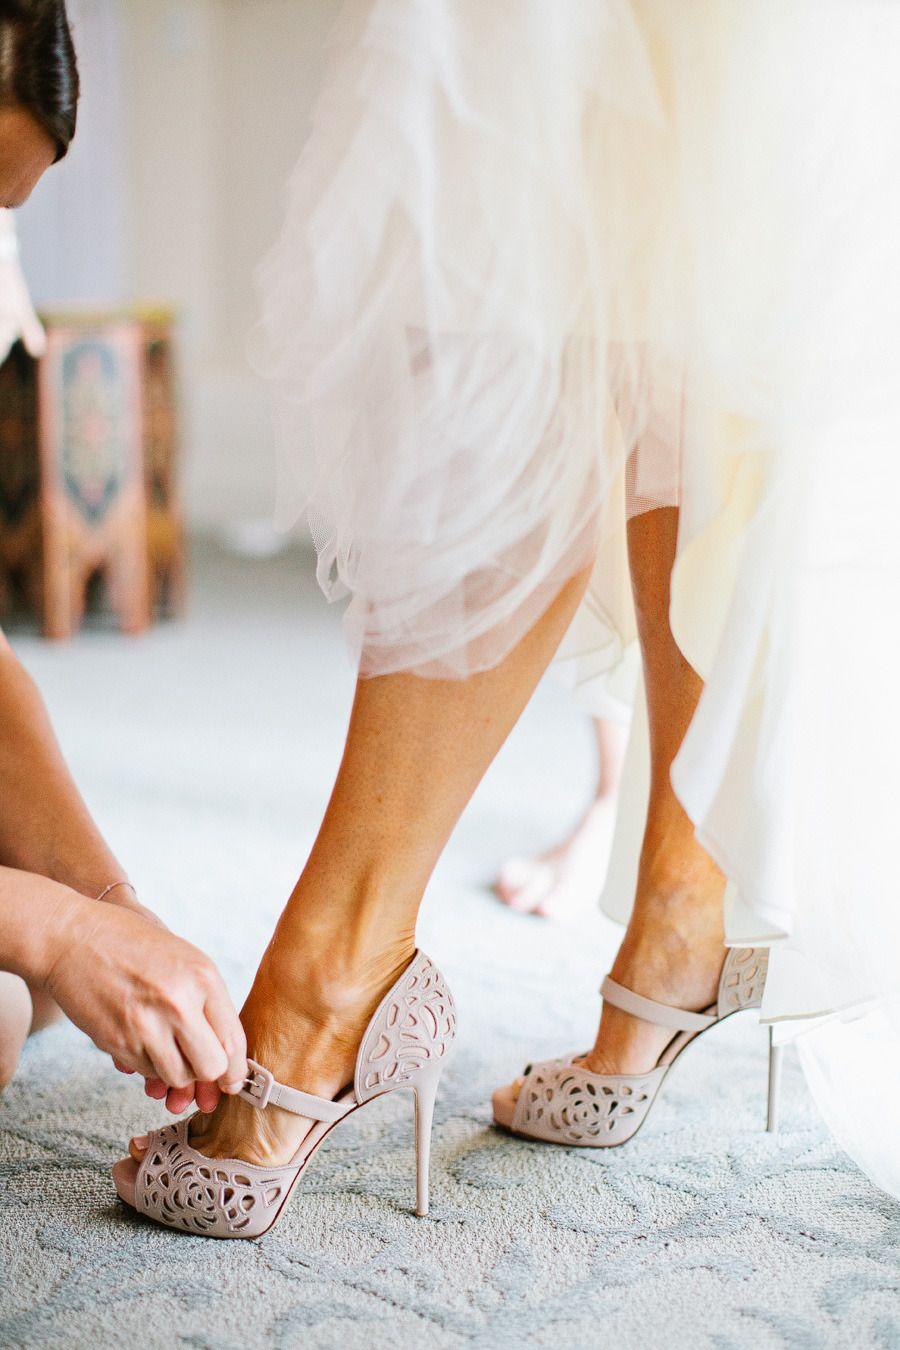 Ojai Wedding from Birds of a Feather | Brautschuhe, Metzger und Schuhe